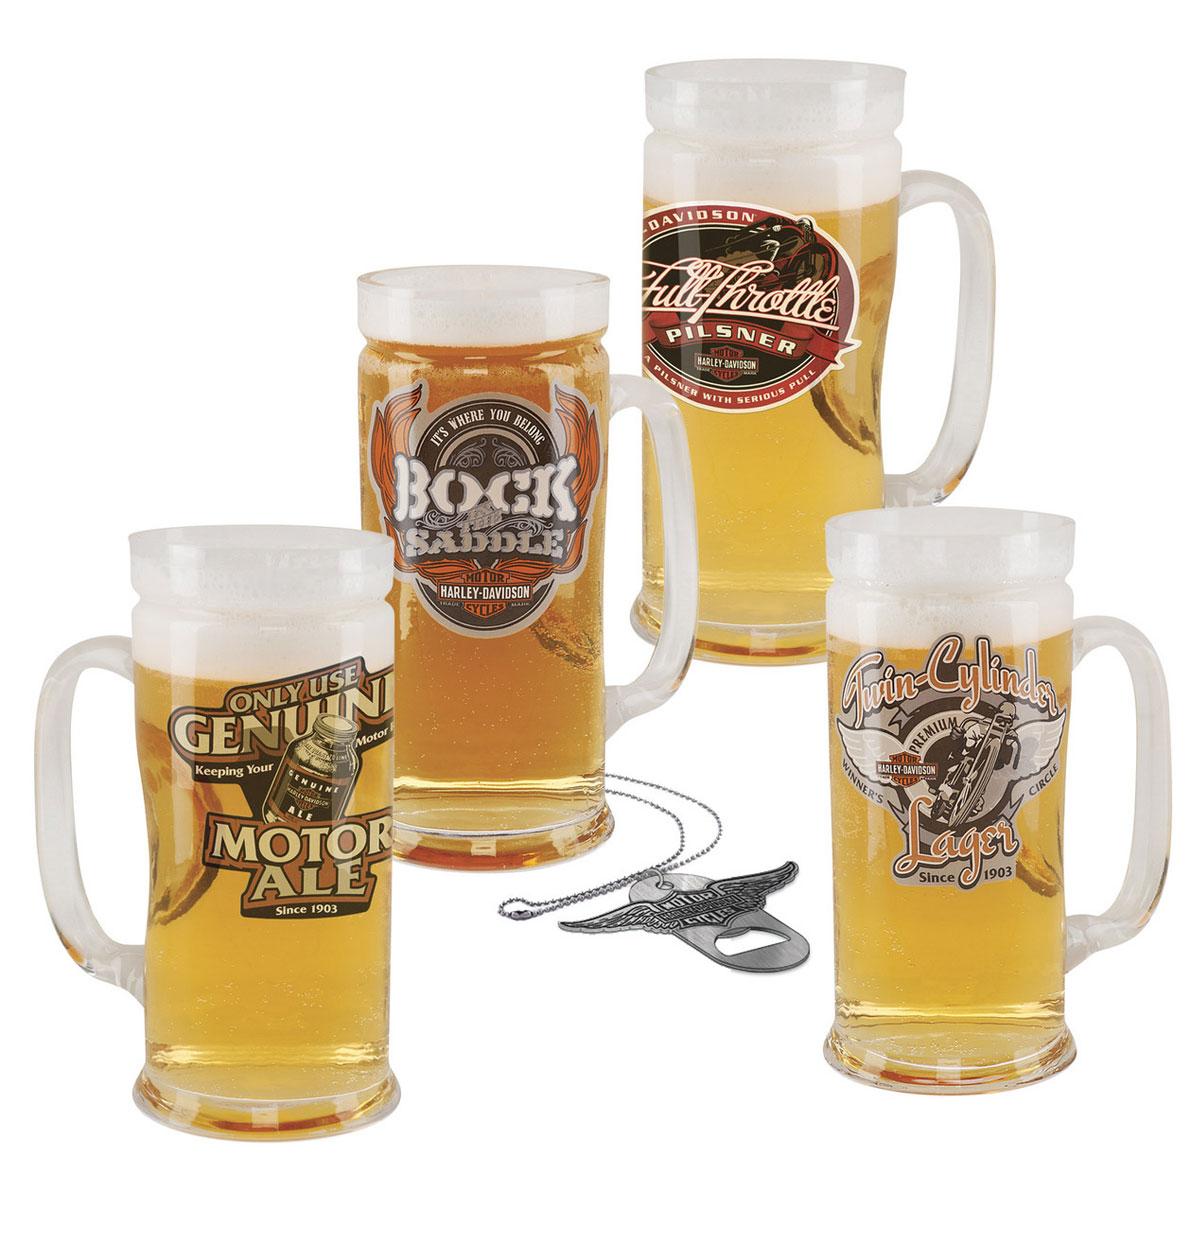 Harley-Davidson Roadhouse Brew Pub Set + Flessen opener - LAATSTE KANS